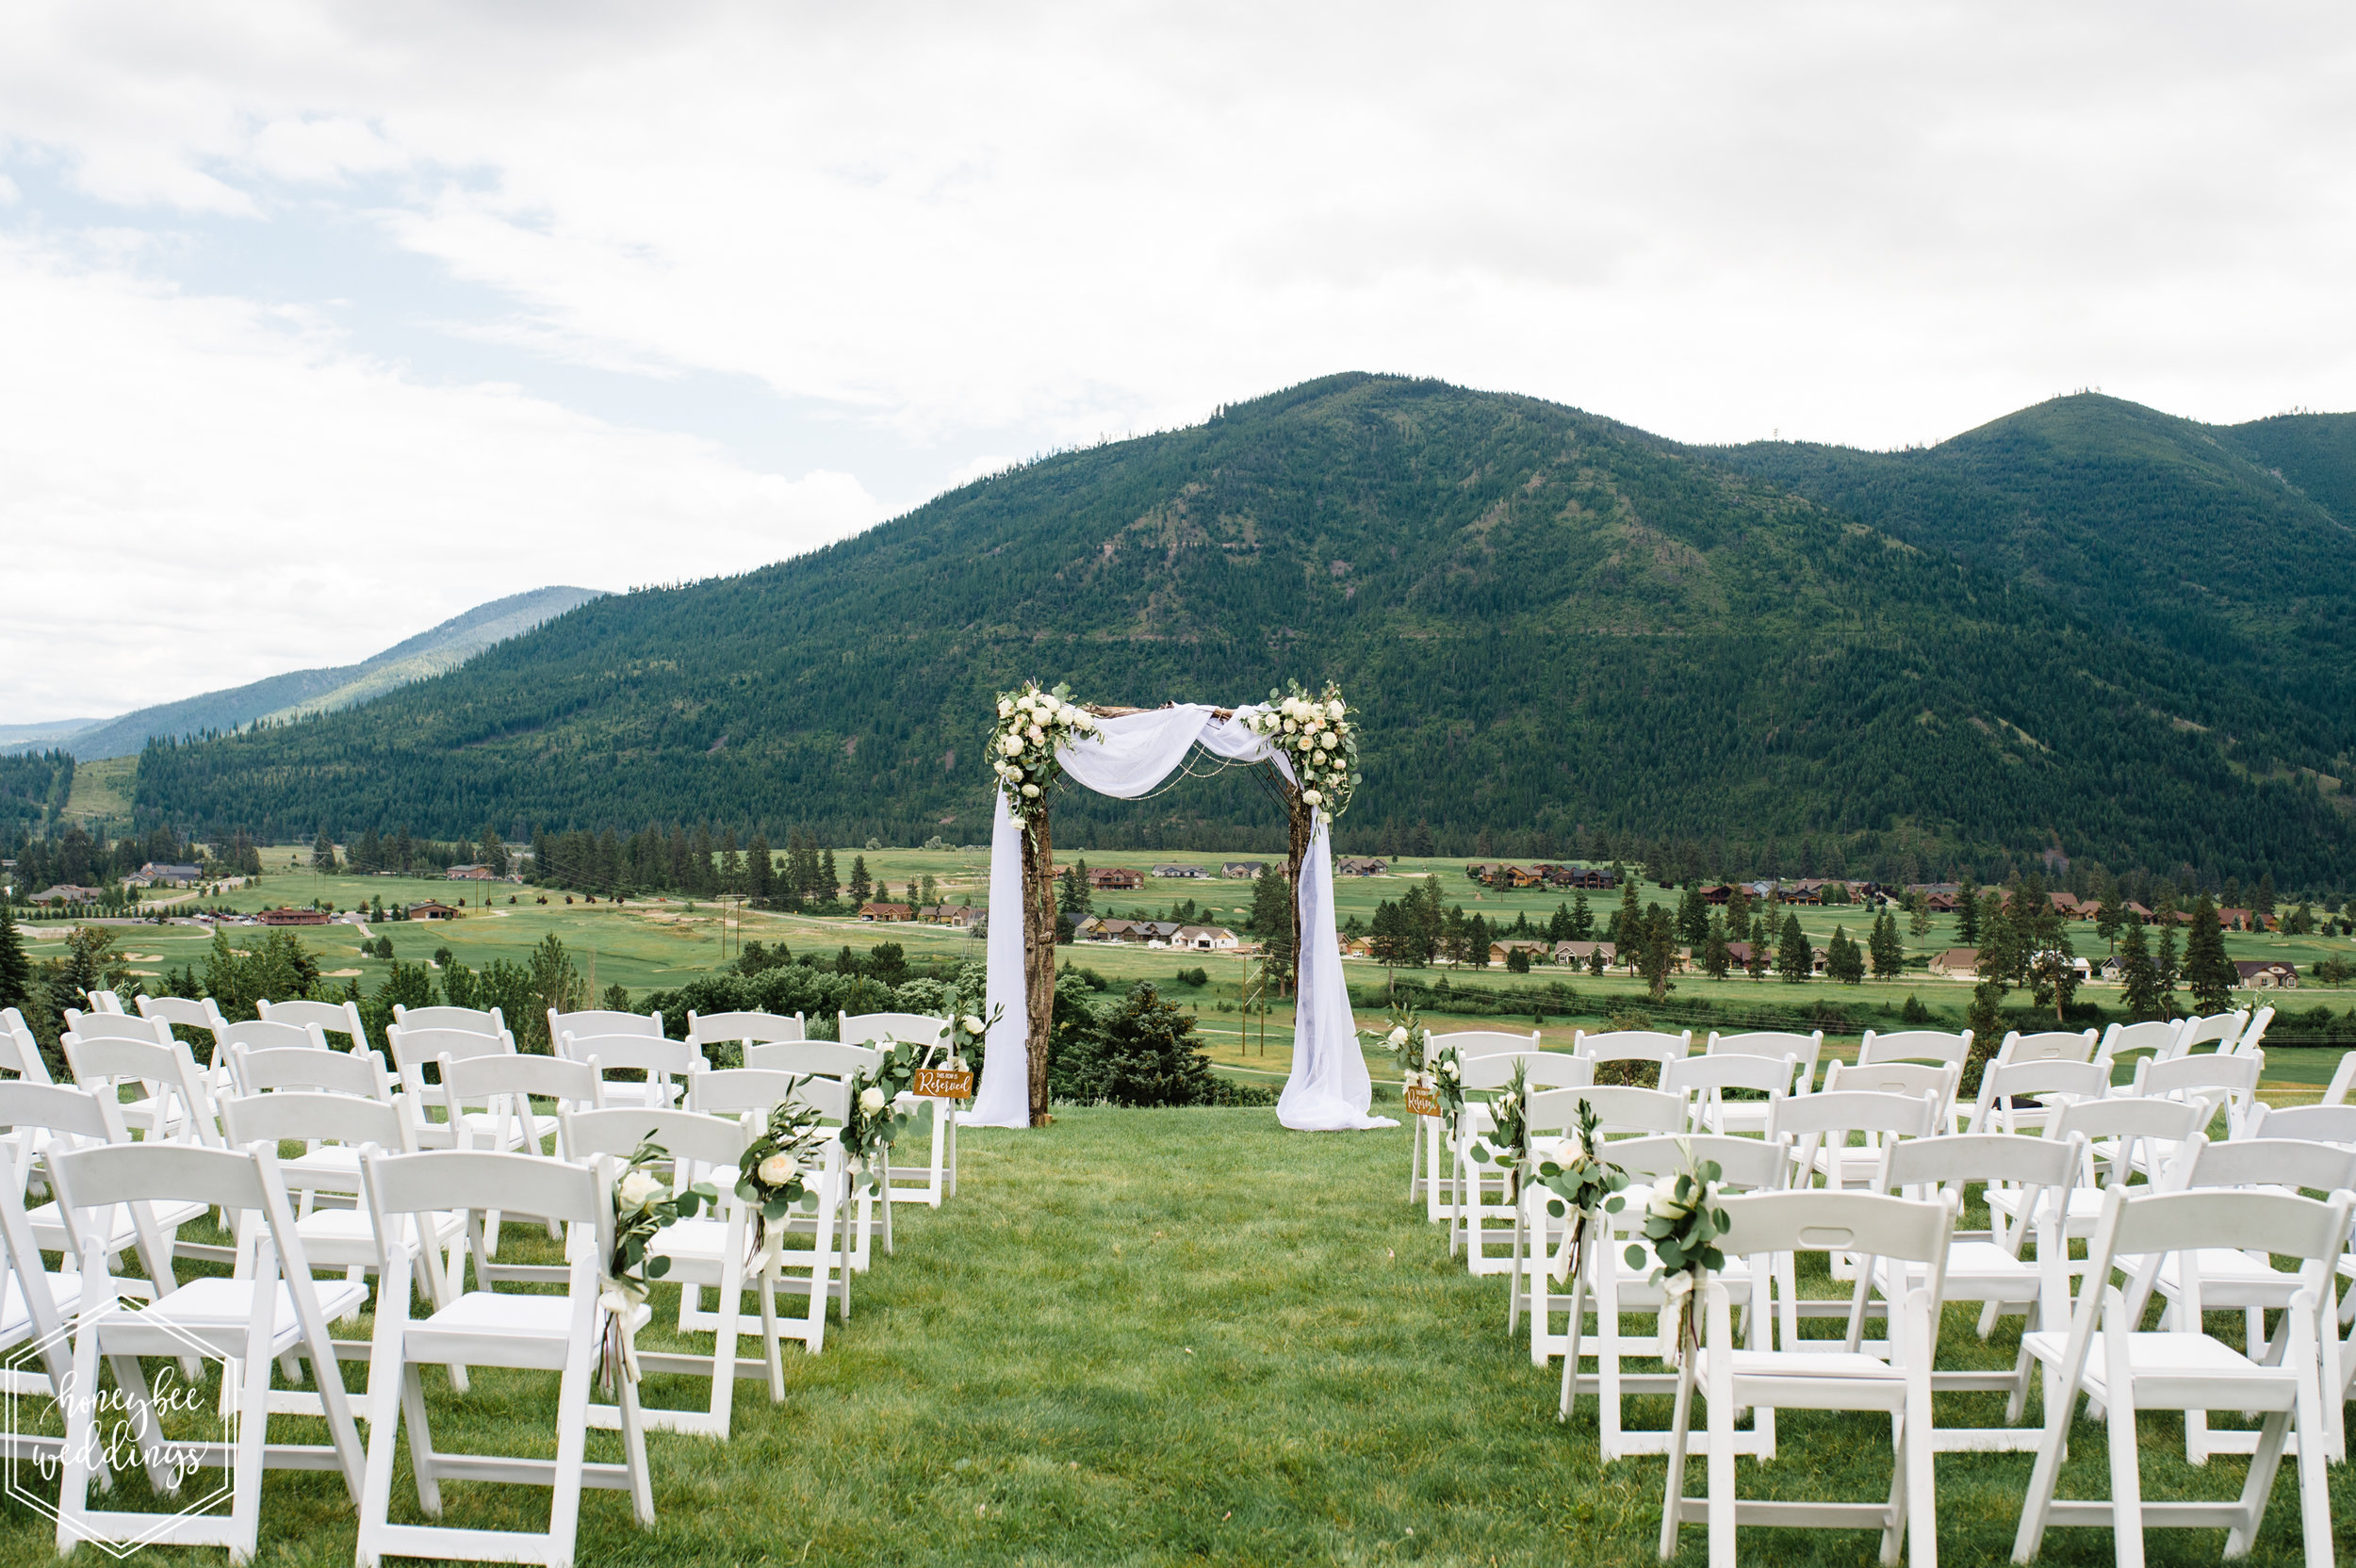 212Montana Wedding Photographer_Missoula Wedding_Honeybee Weddings_Devlin & Jacob_June 22, 2019-2795.jpg